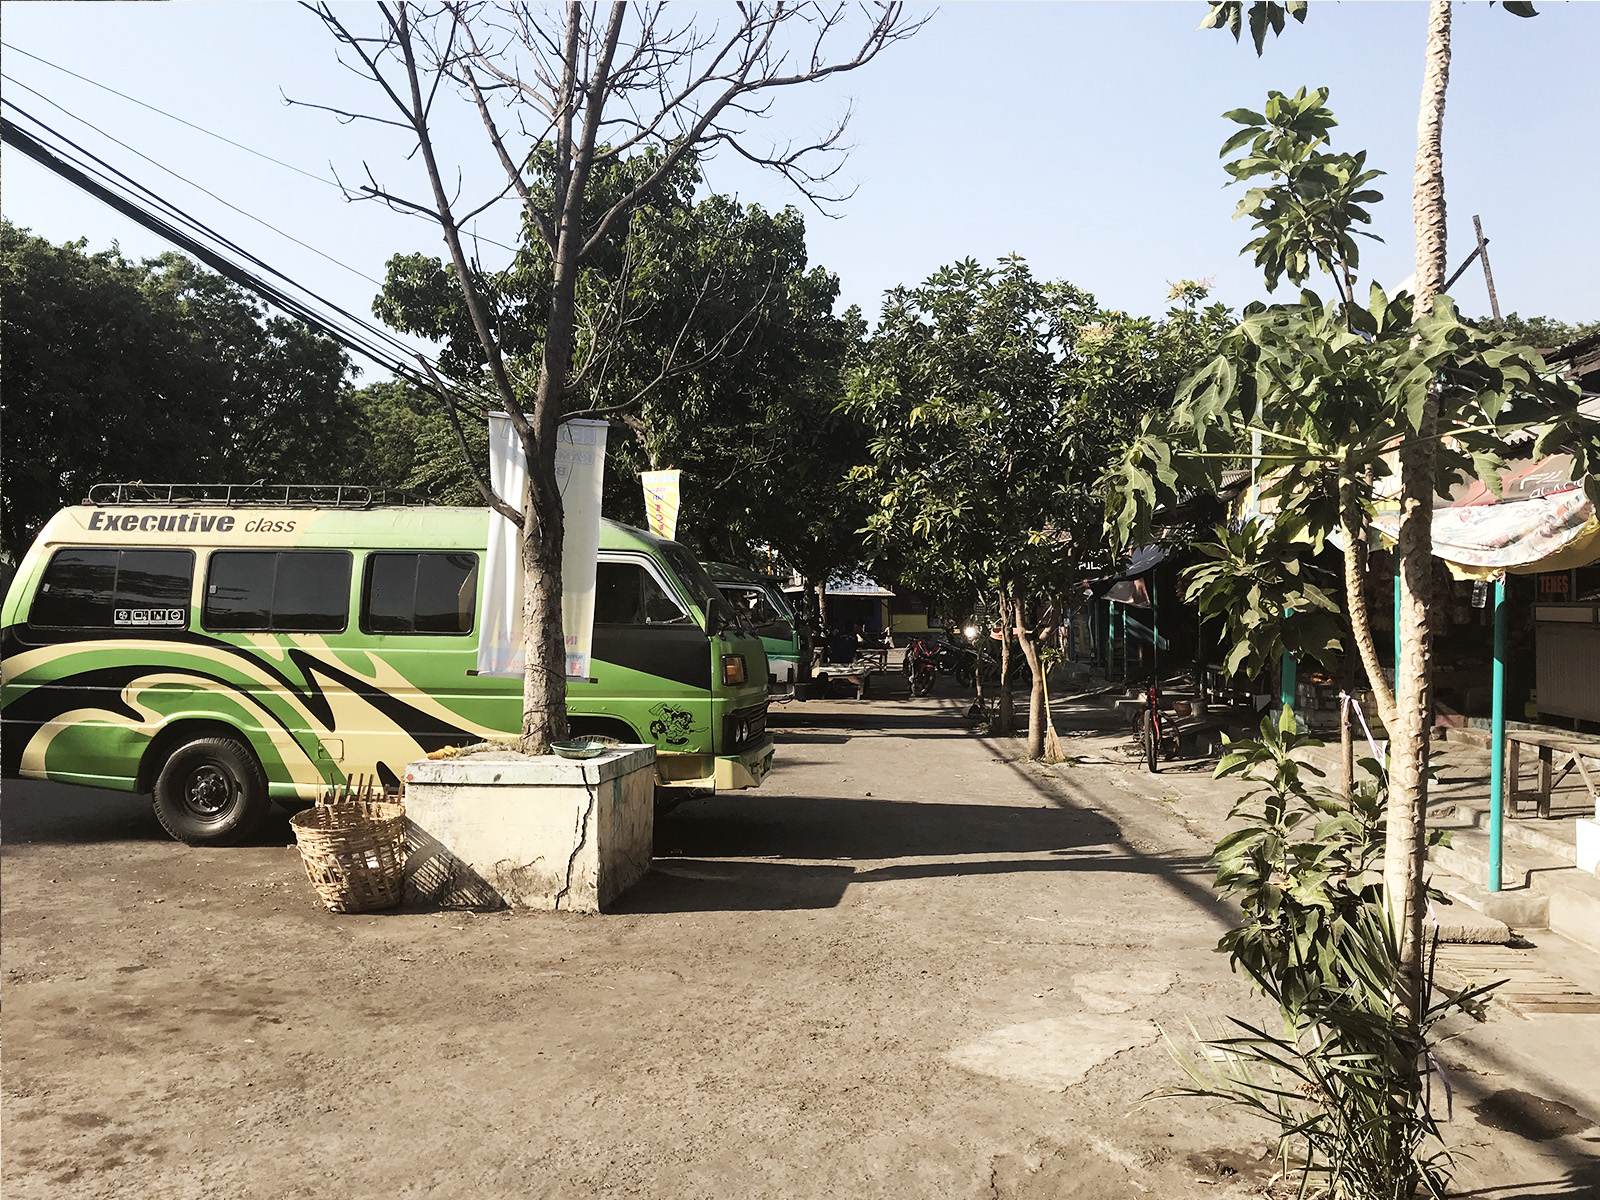 17 JAWA - Jawa: wulkan Ijen, Bromo, Yogyakarta i świątynie